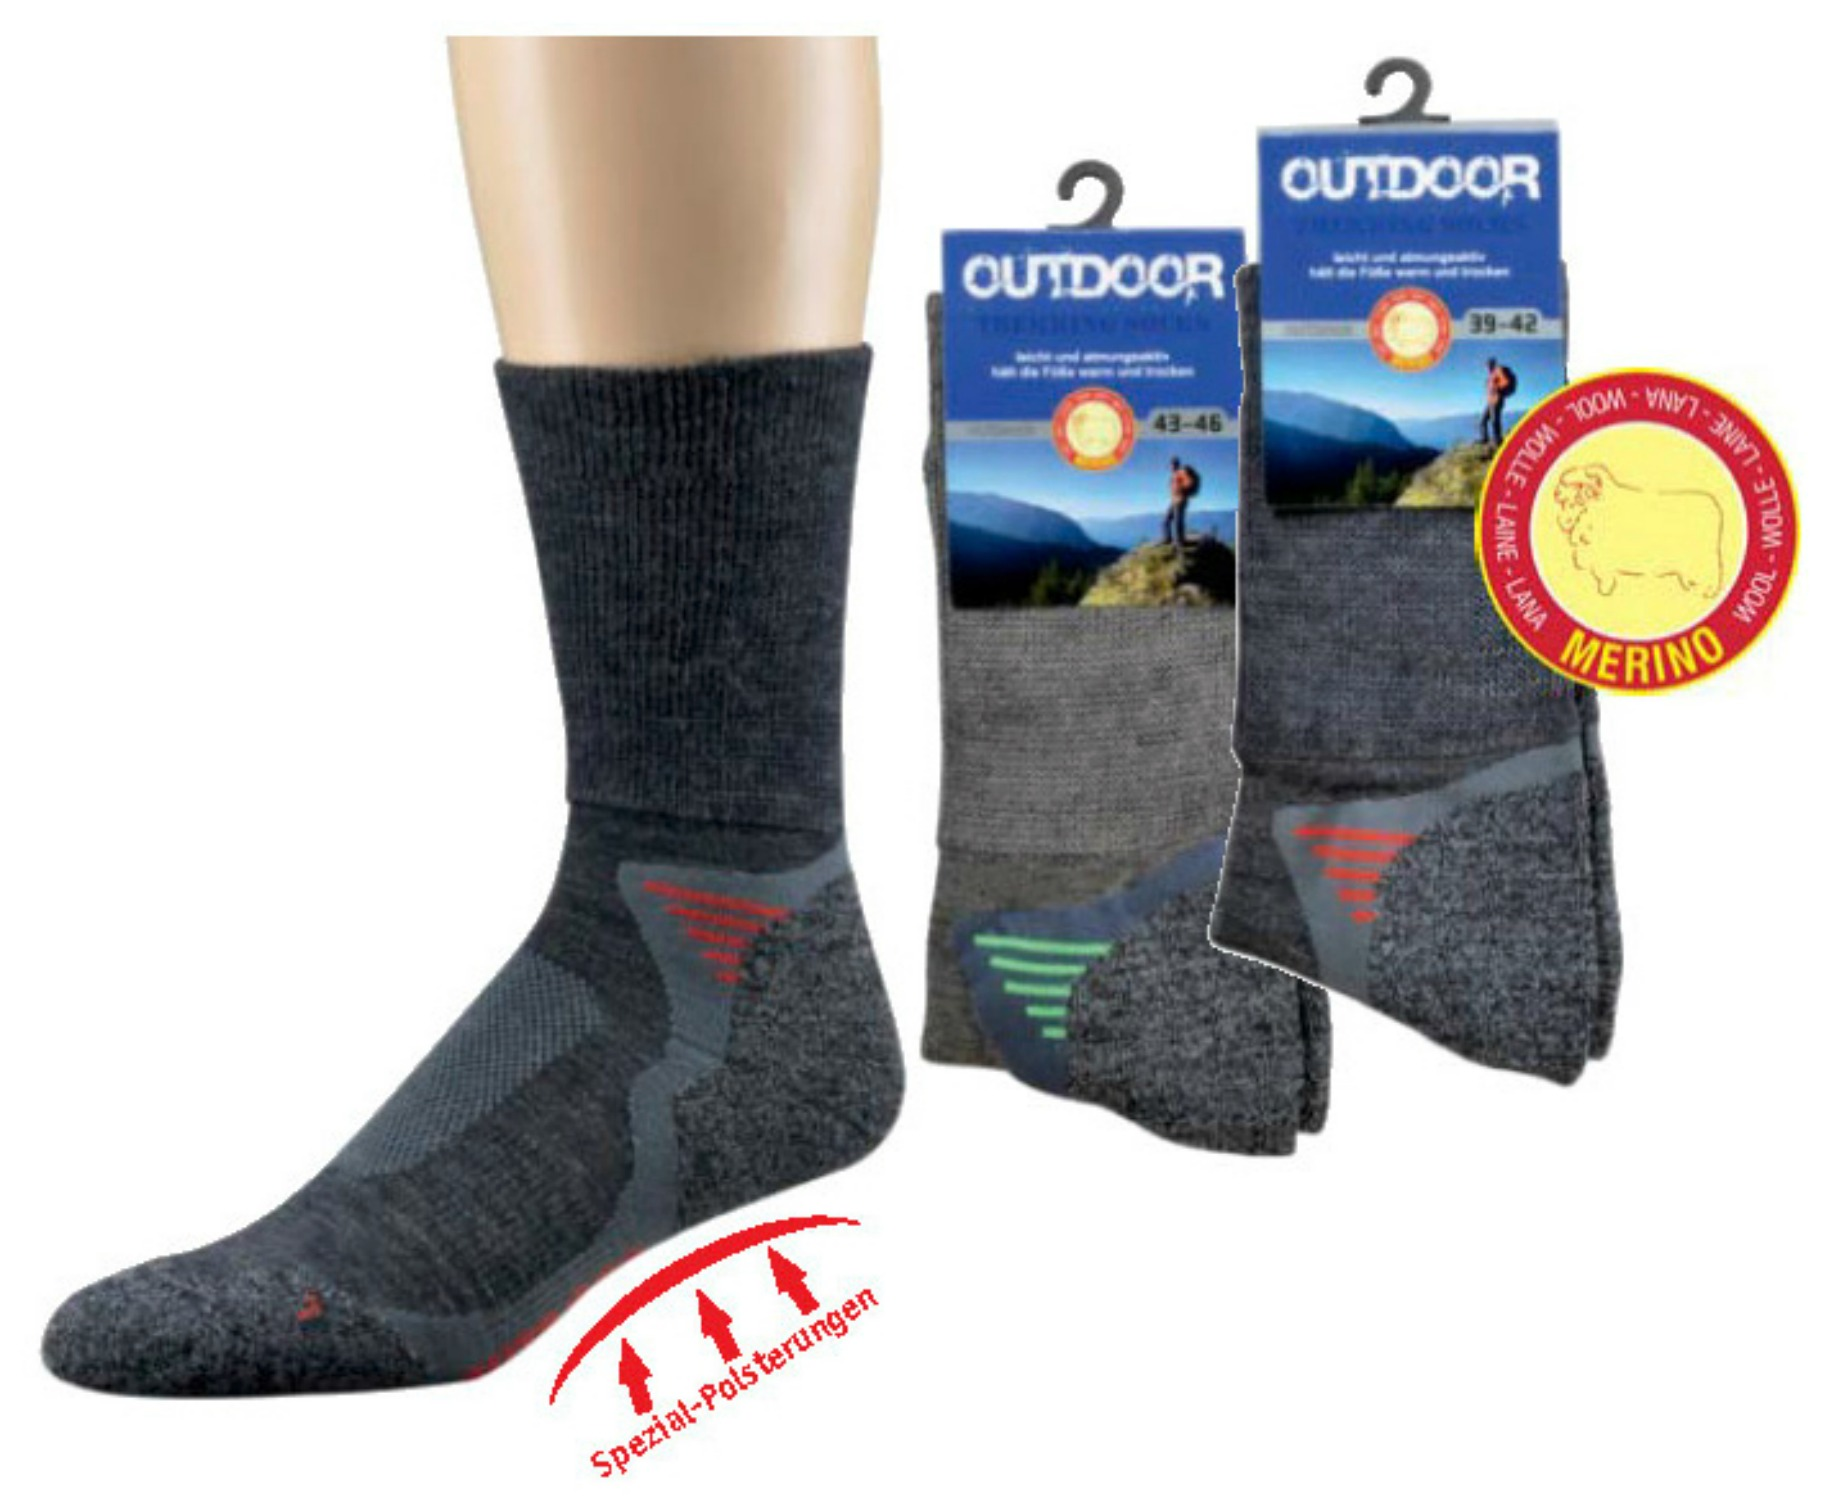 2 Paar Funktions- u. Trekking-Socken mit Merinowolle